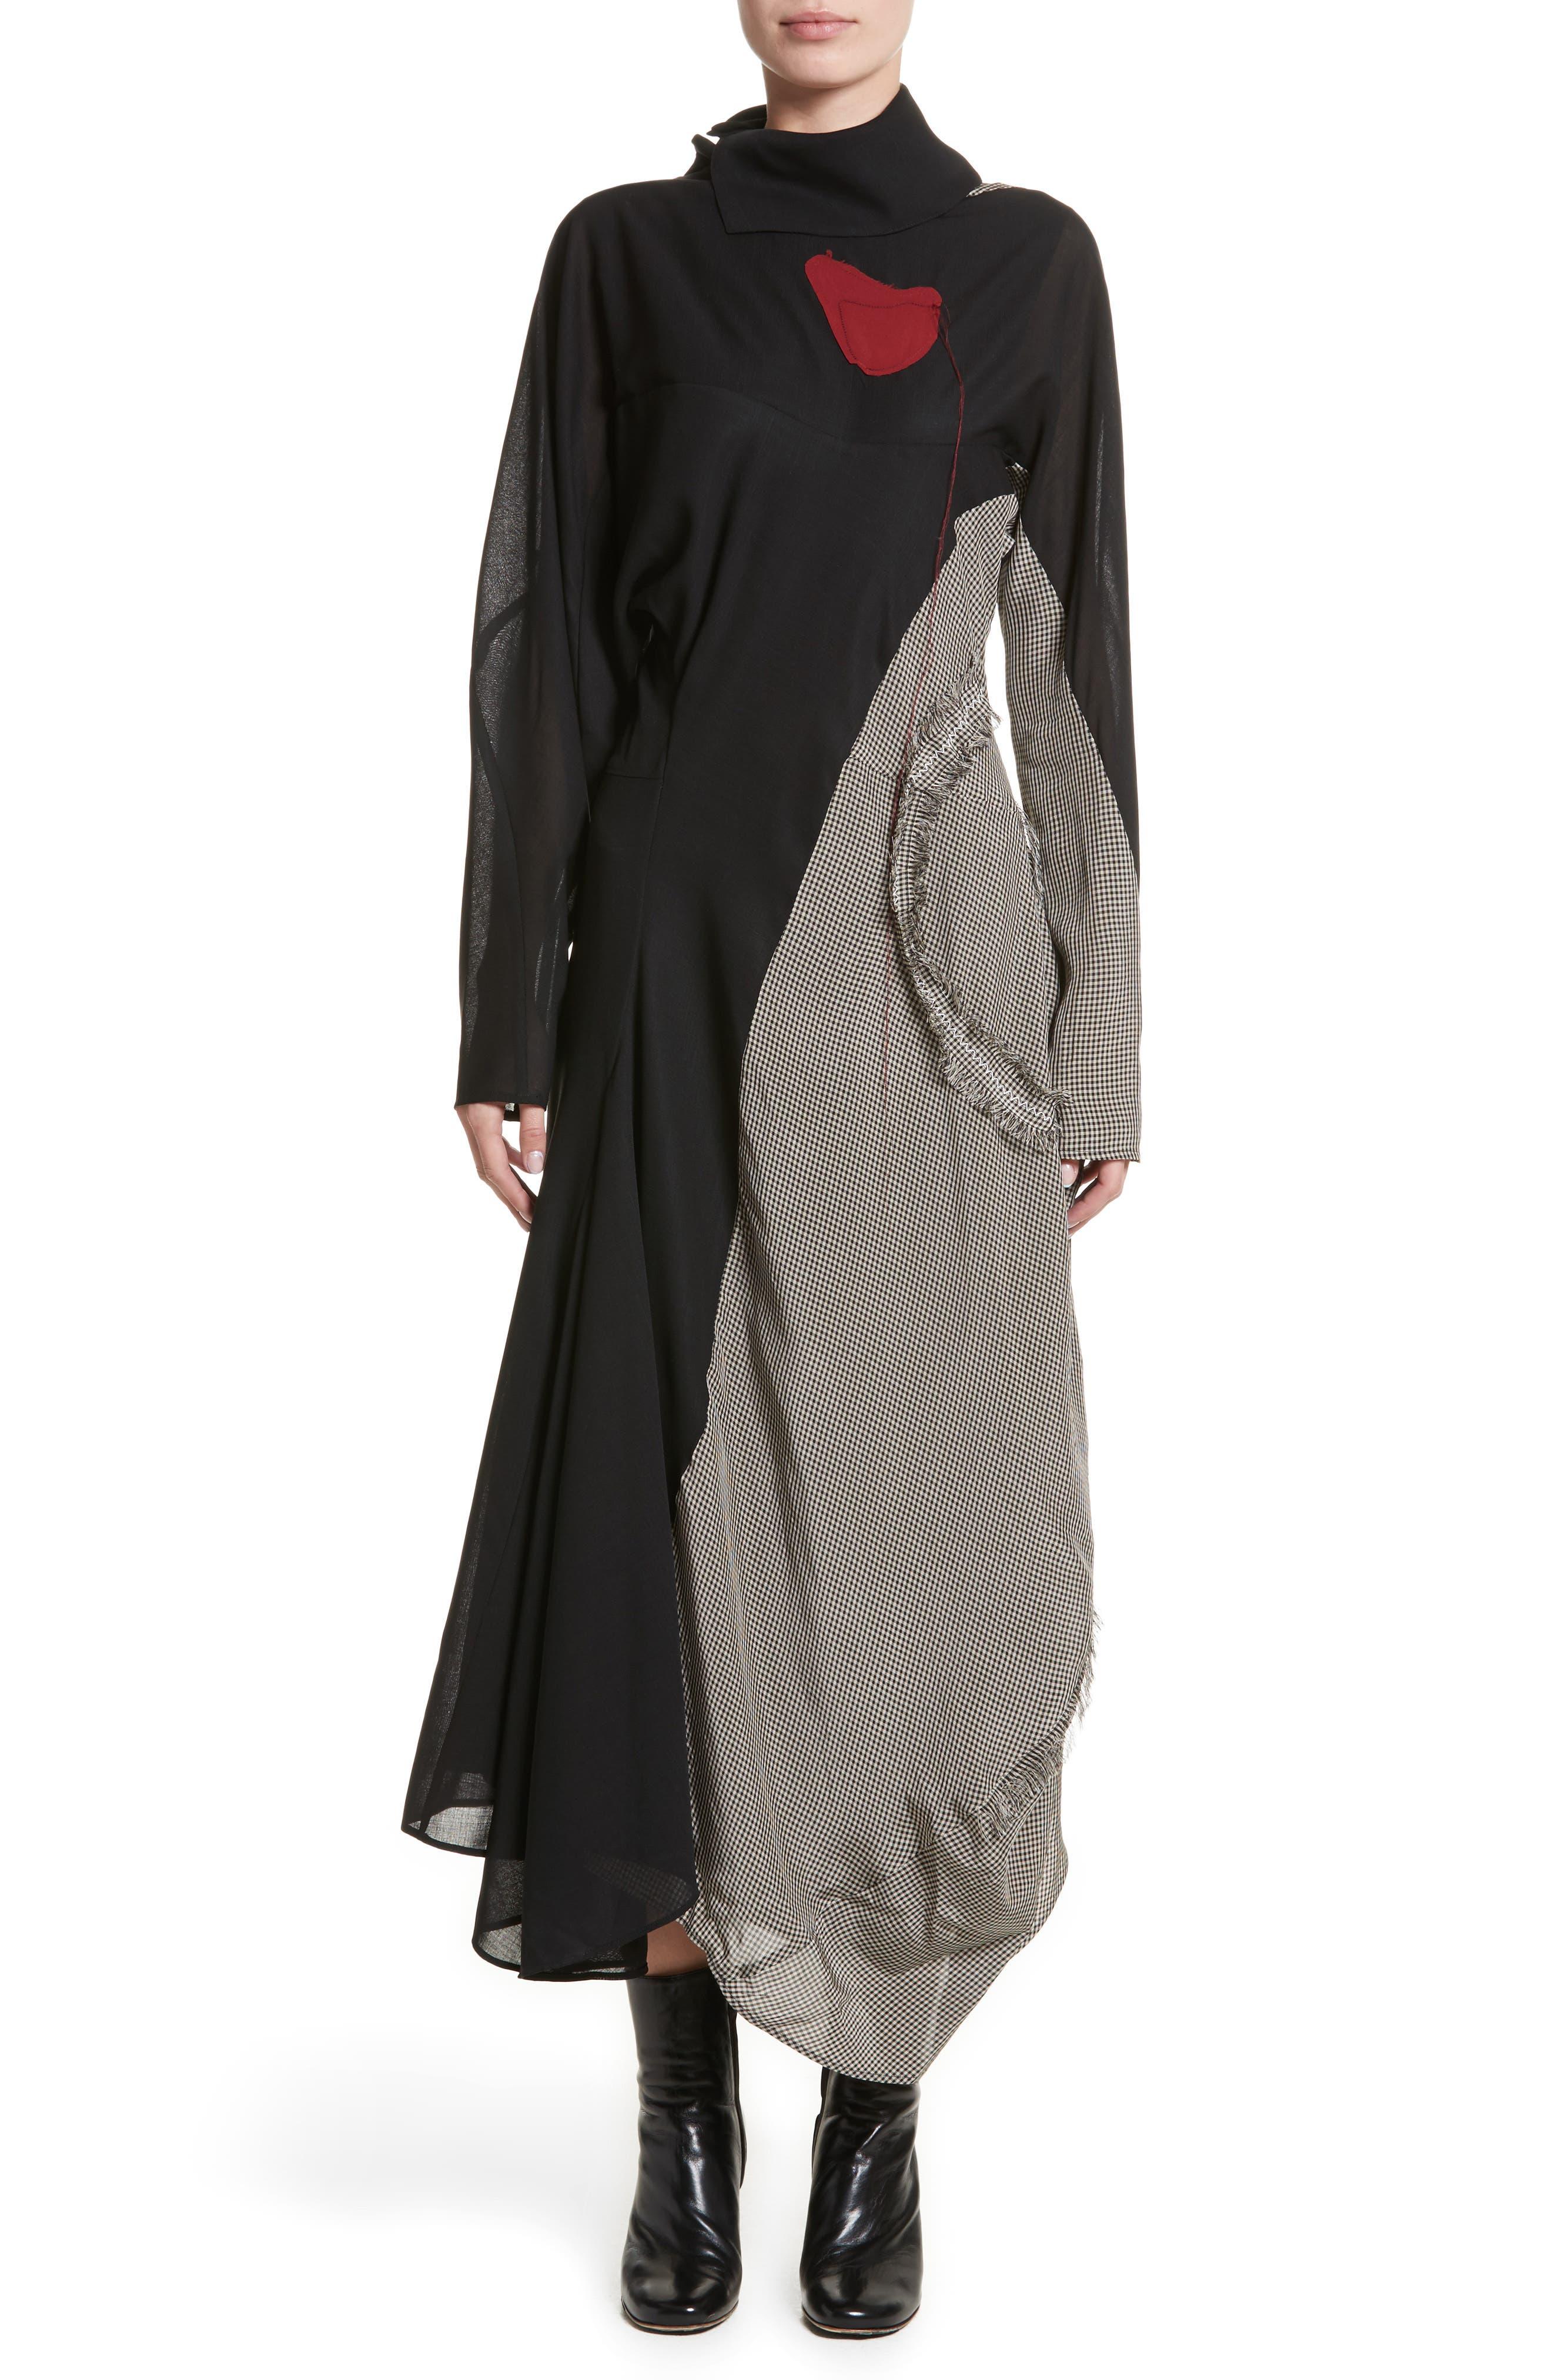 Dragica Mixed Media Dress,                             Main thumbnail 1, color,                             Black